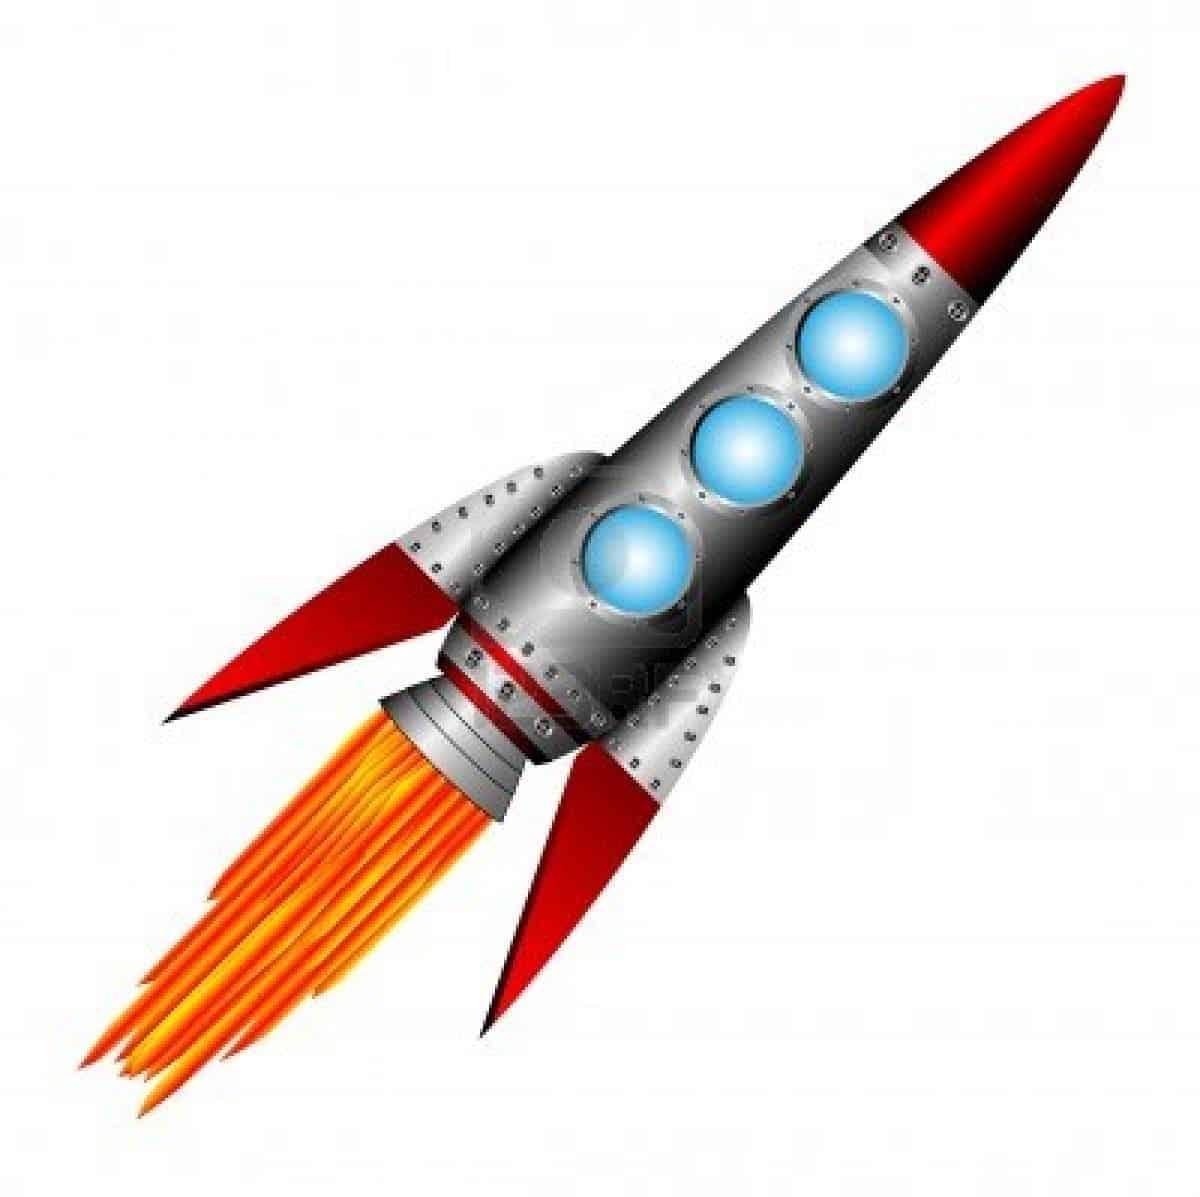 10946122 starting rocket on white background vector illustration Πως Να Πετύχεις Το 2014 Όποιον Στόχο Επιθυμείς!